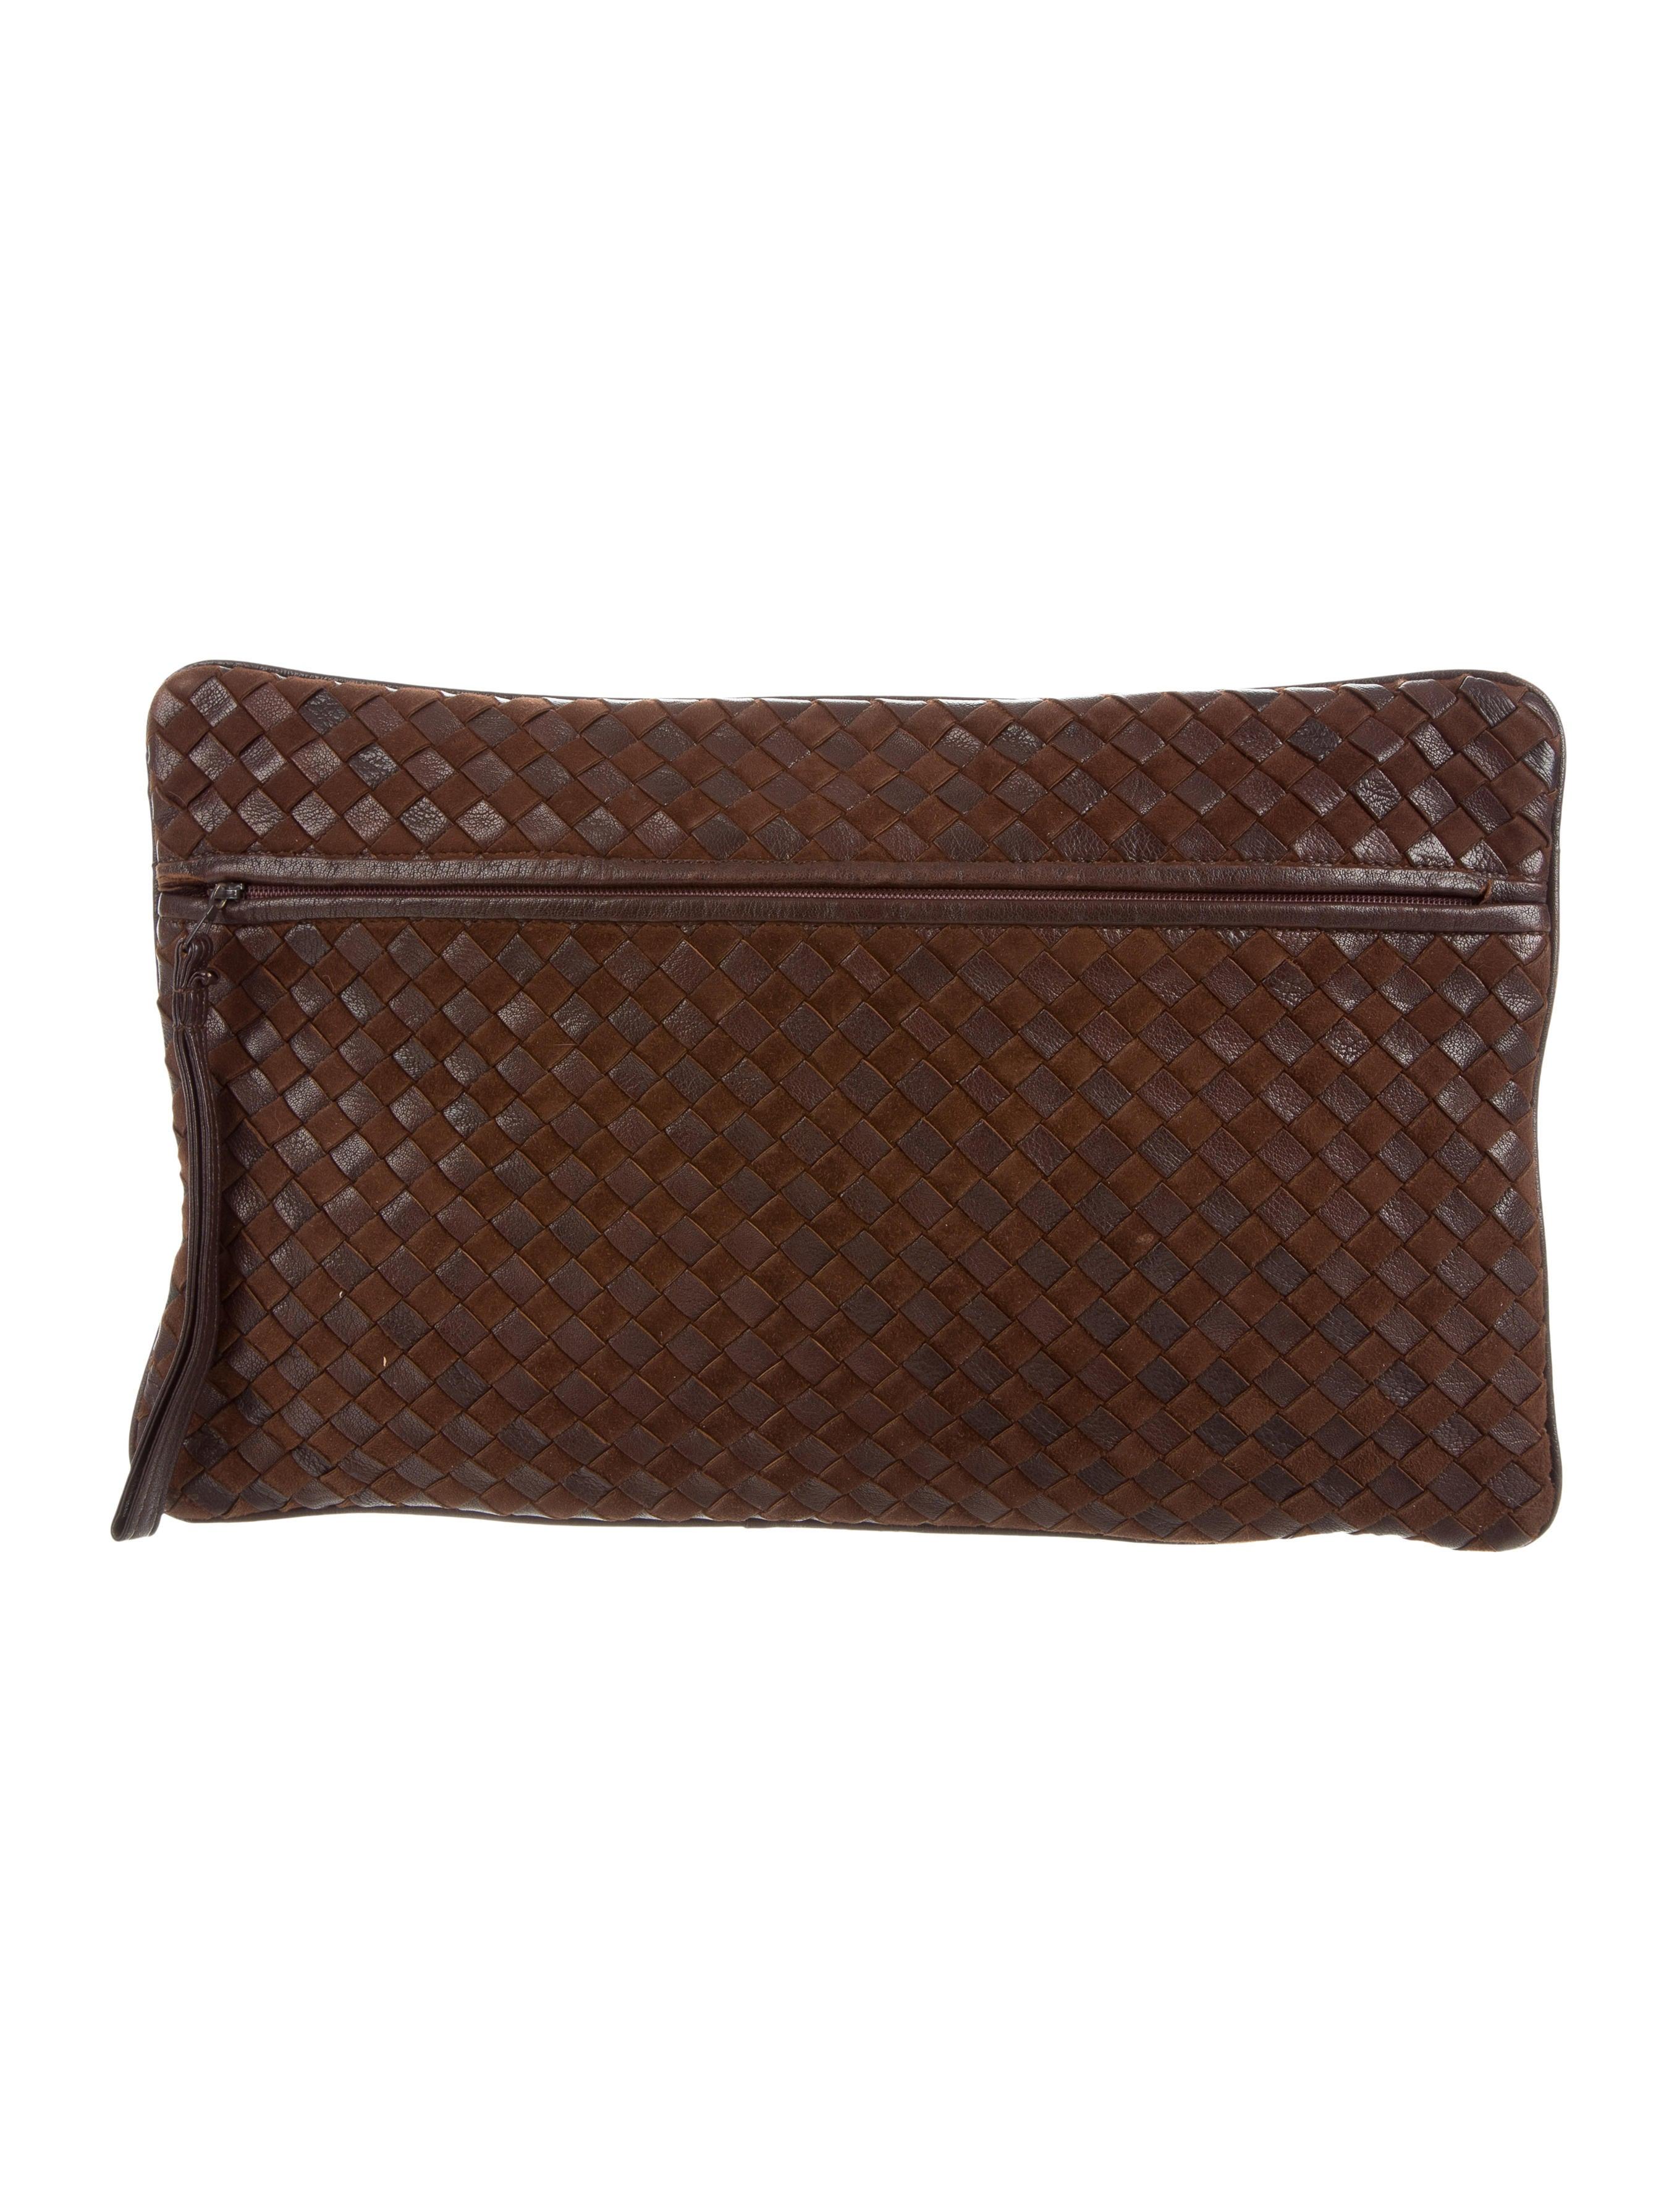 bottega veneta large intrecciato clutch handbags bot46915 the realreal. Black Bedroom Furniture Sets. Home Design Ideas